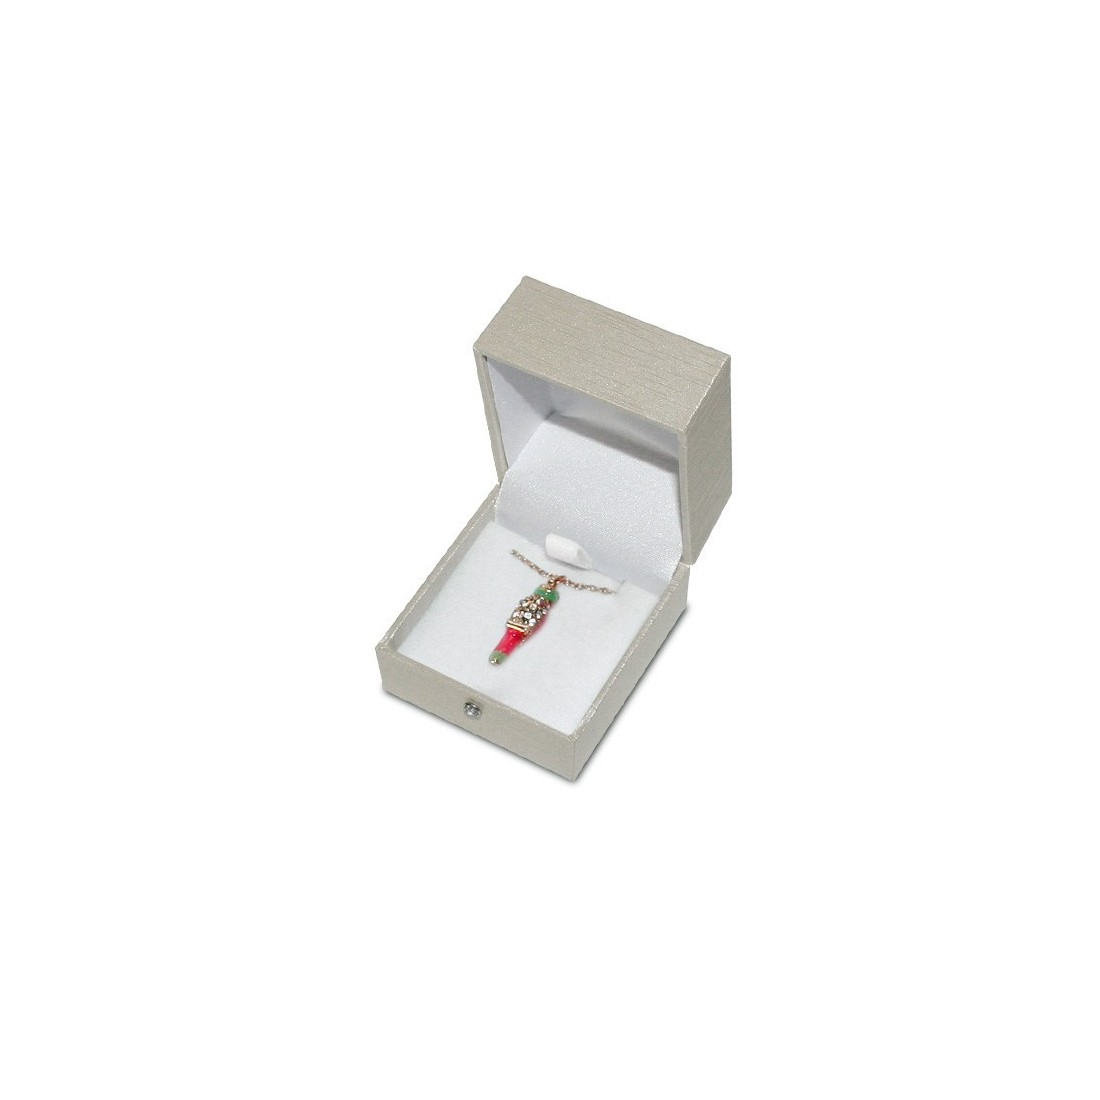 Venezia jewellery Box, Universal